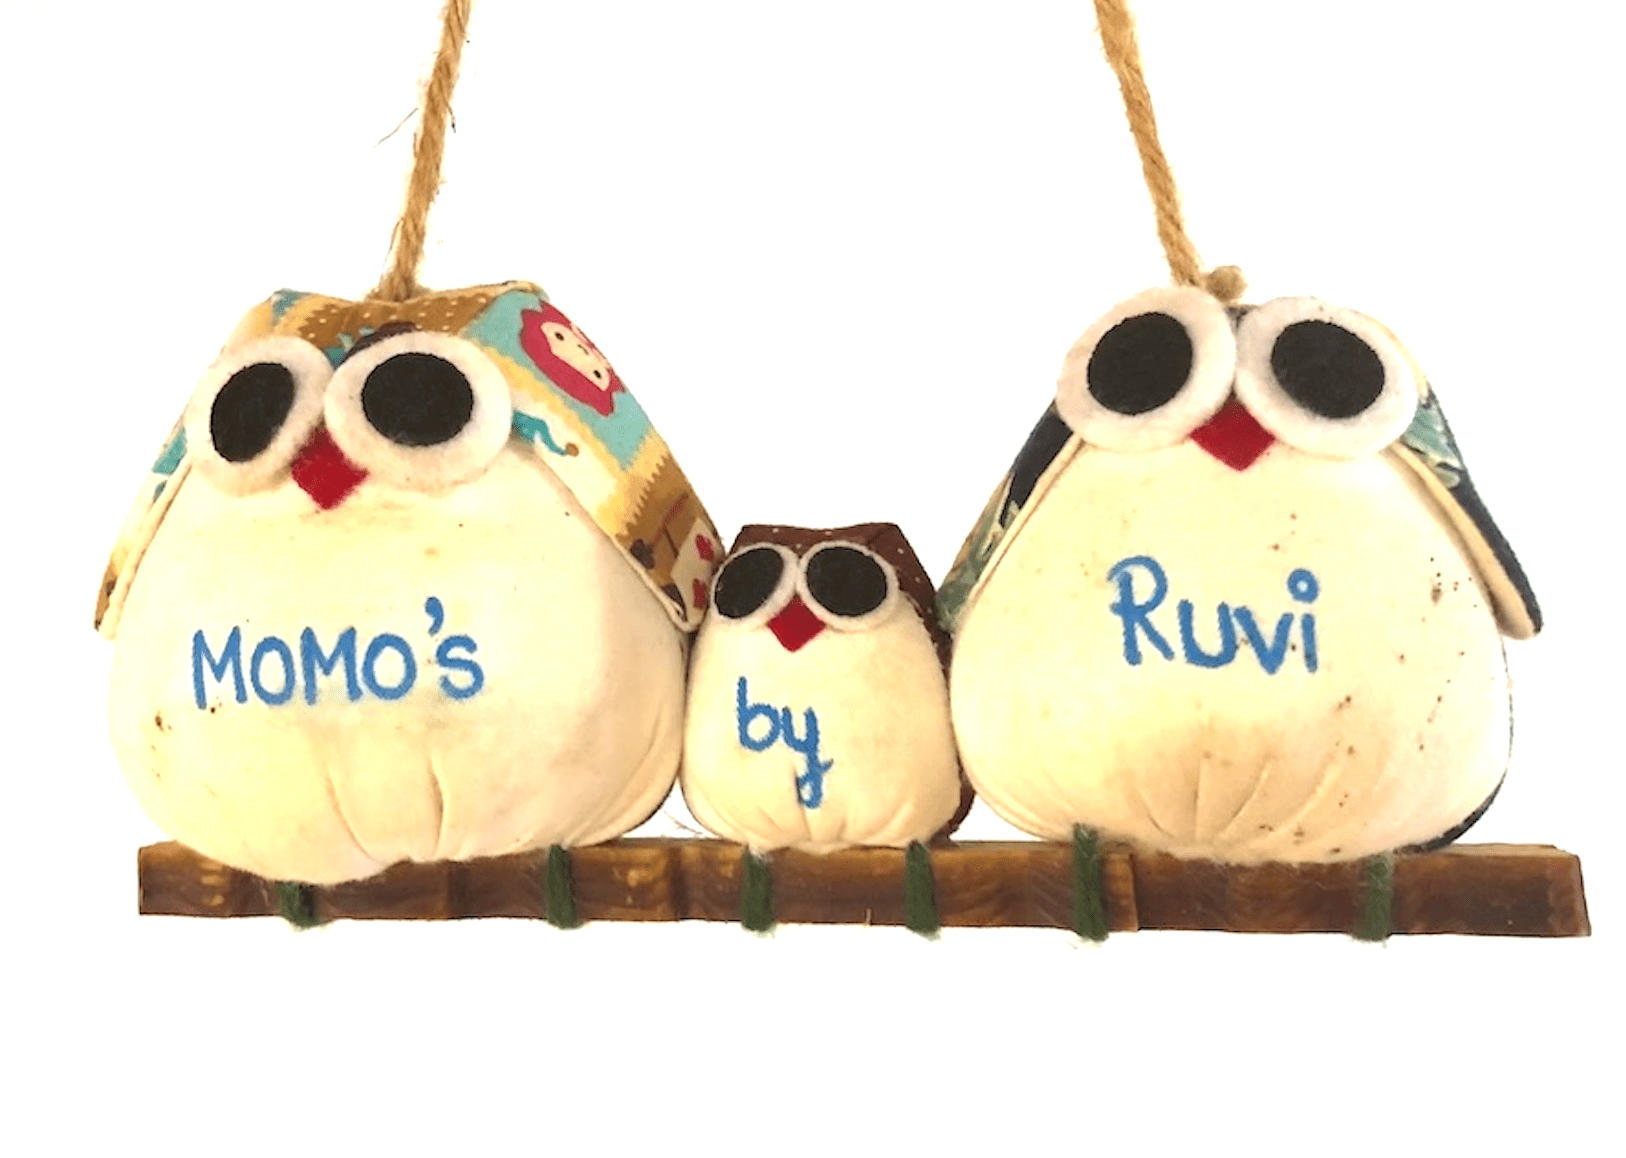 Momo's by Ruvi - Tibetan Vegan Dumplings in Colombo